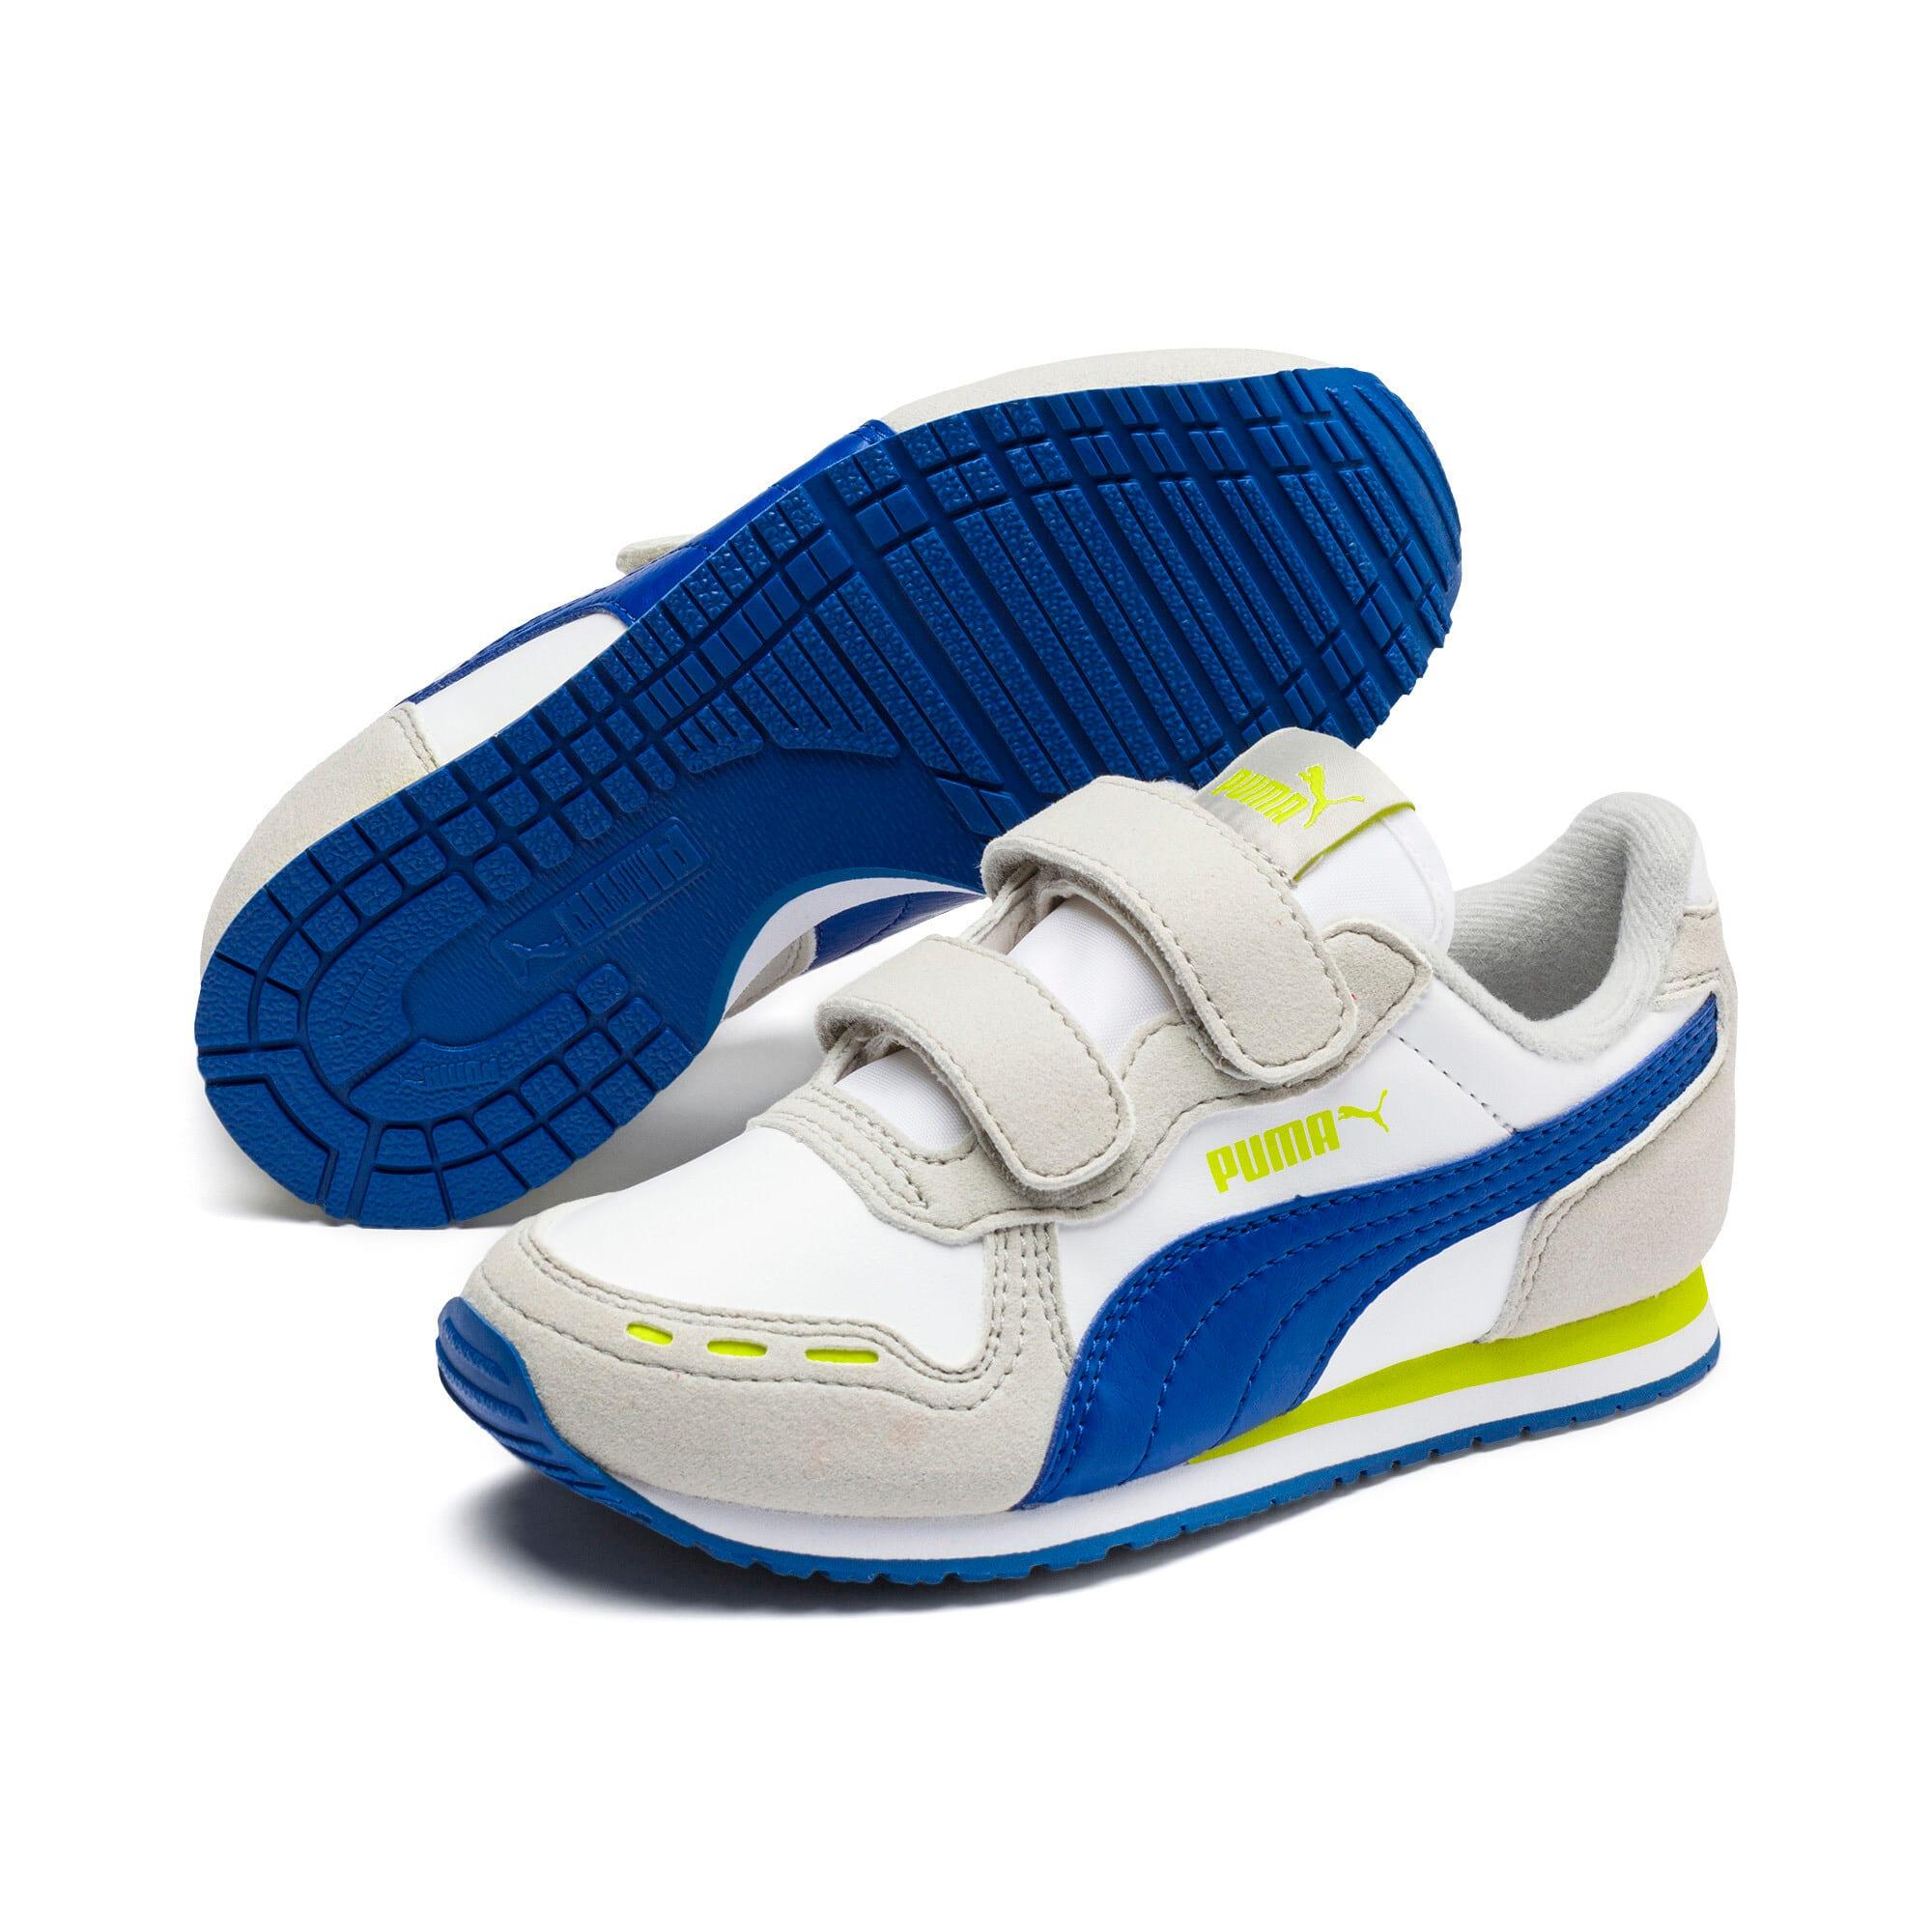 Thumbnail 2 of Cabana Racer SL V PS Baby Sneaker, Puma White-Galaxy Blue, medium